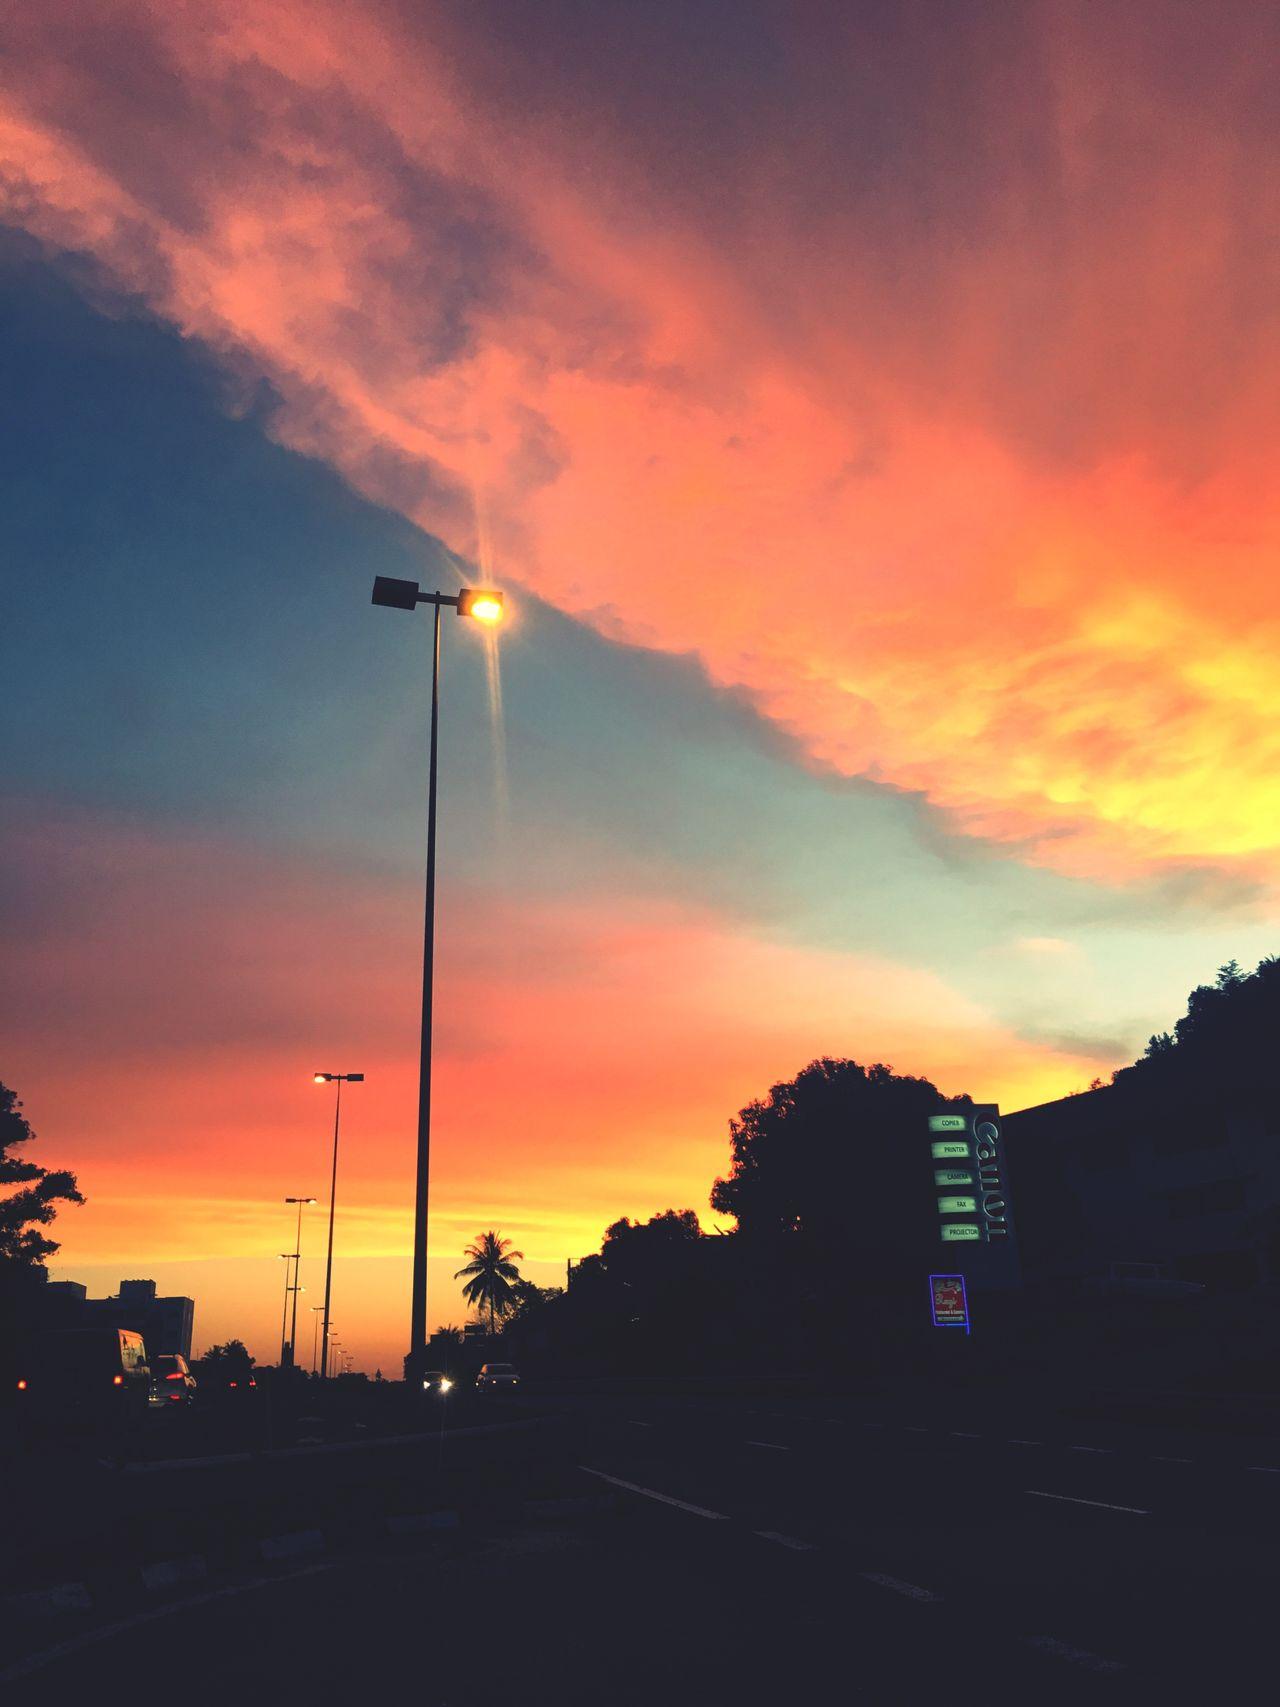 Brunei Darussalam Sunset Sky No People Cloud - Sky Silhouette Outdoors Street Light Brunei IPhoneography Nature EyeEmNewHere EyeEmNewHere